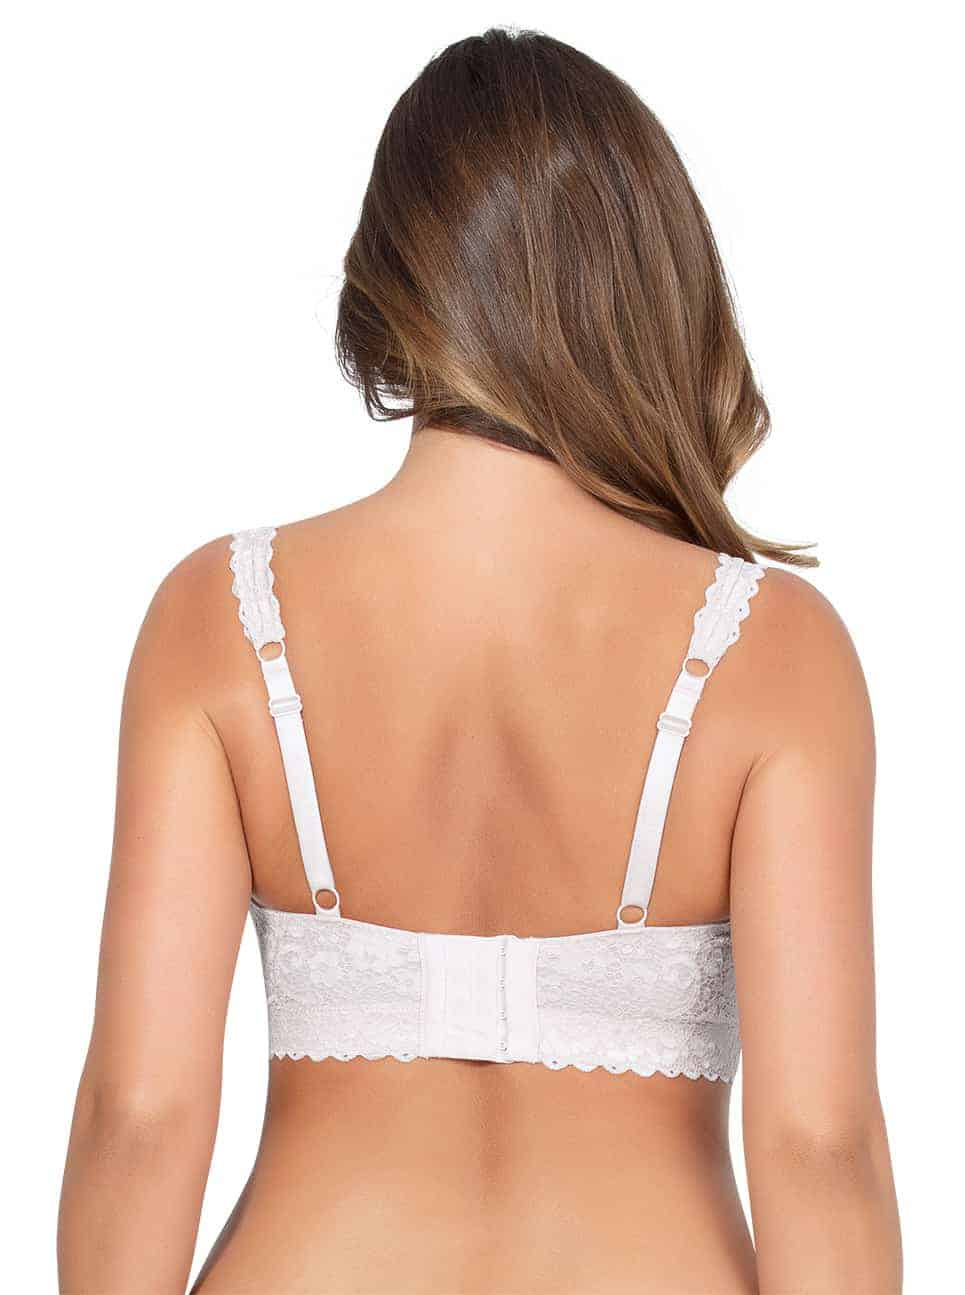 PARFAIT Adriana LaceBraletteP5482 PearlWhite Back copy - Adriana Lace Bralette - Pearl White - P5482